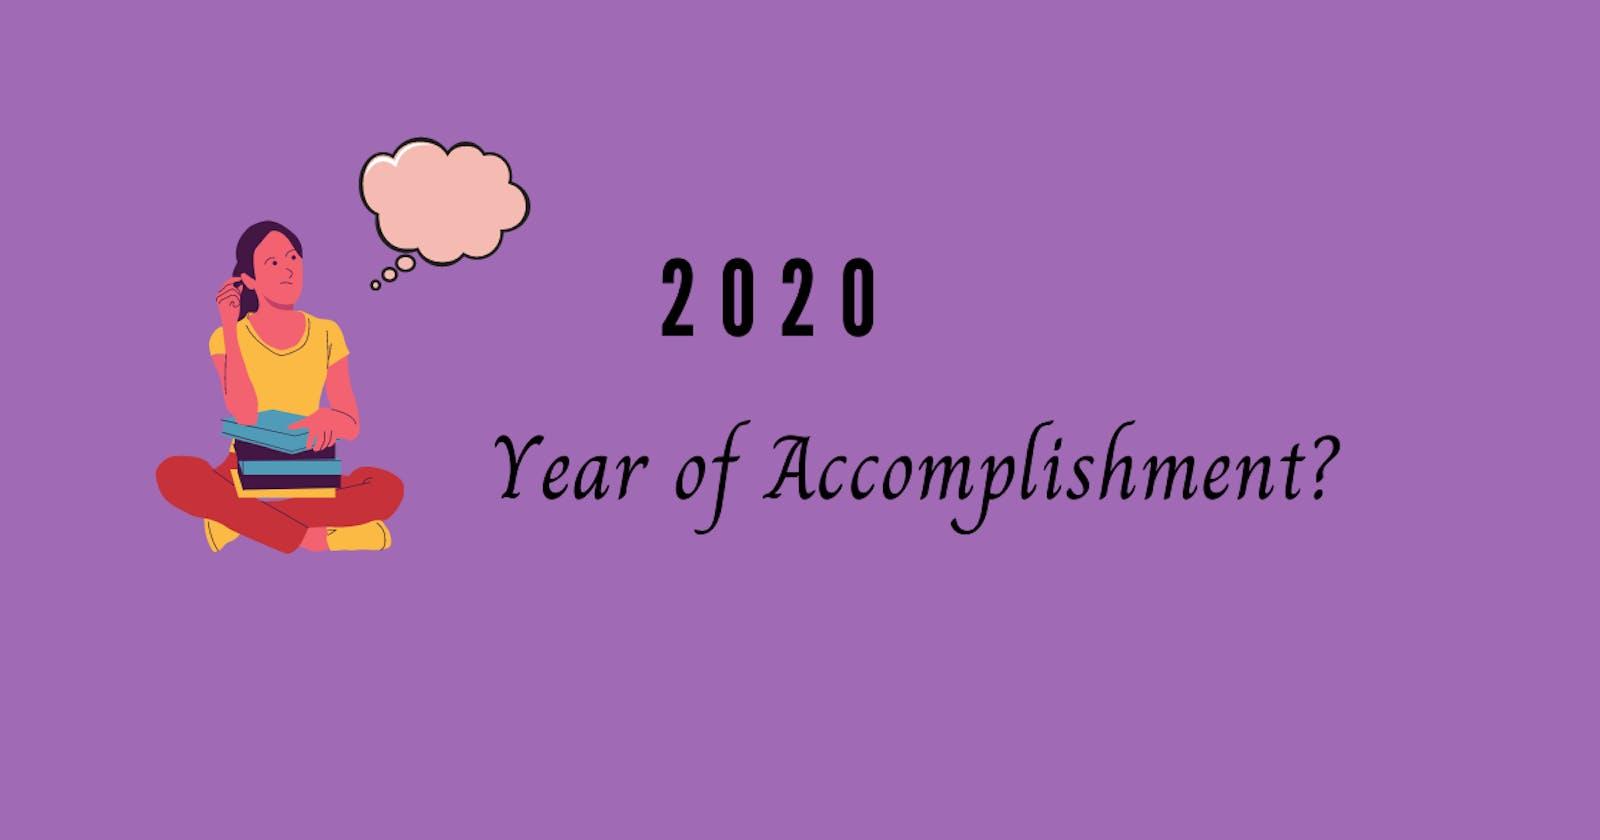 2020....Year of Accomplishment?